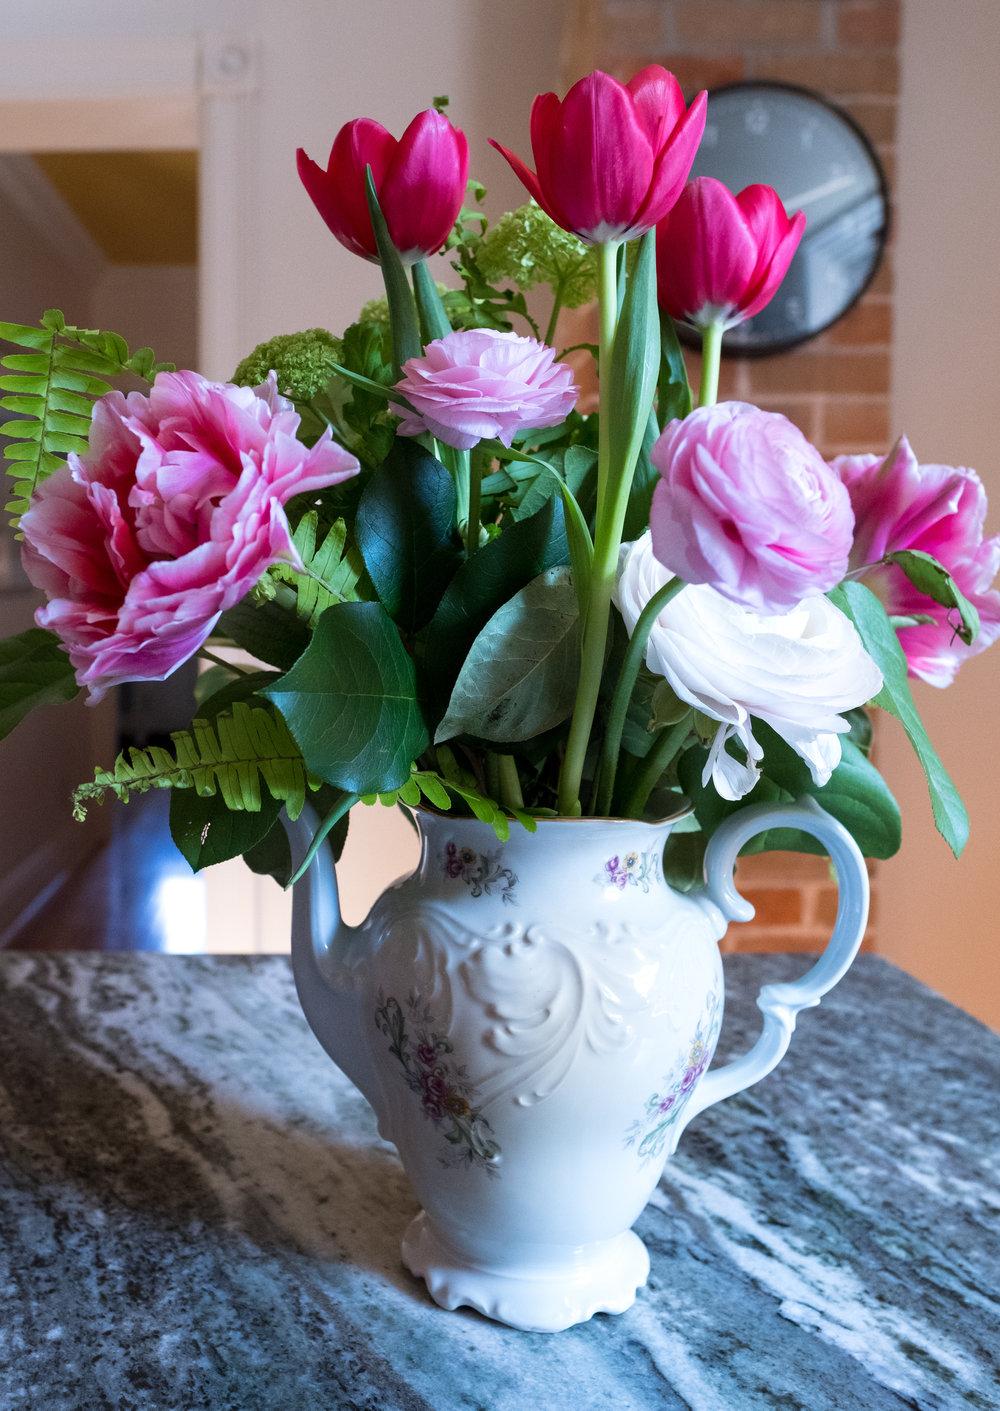 how to cherish sentimental items